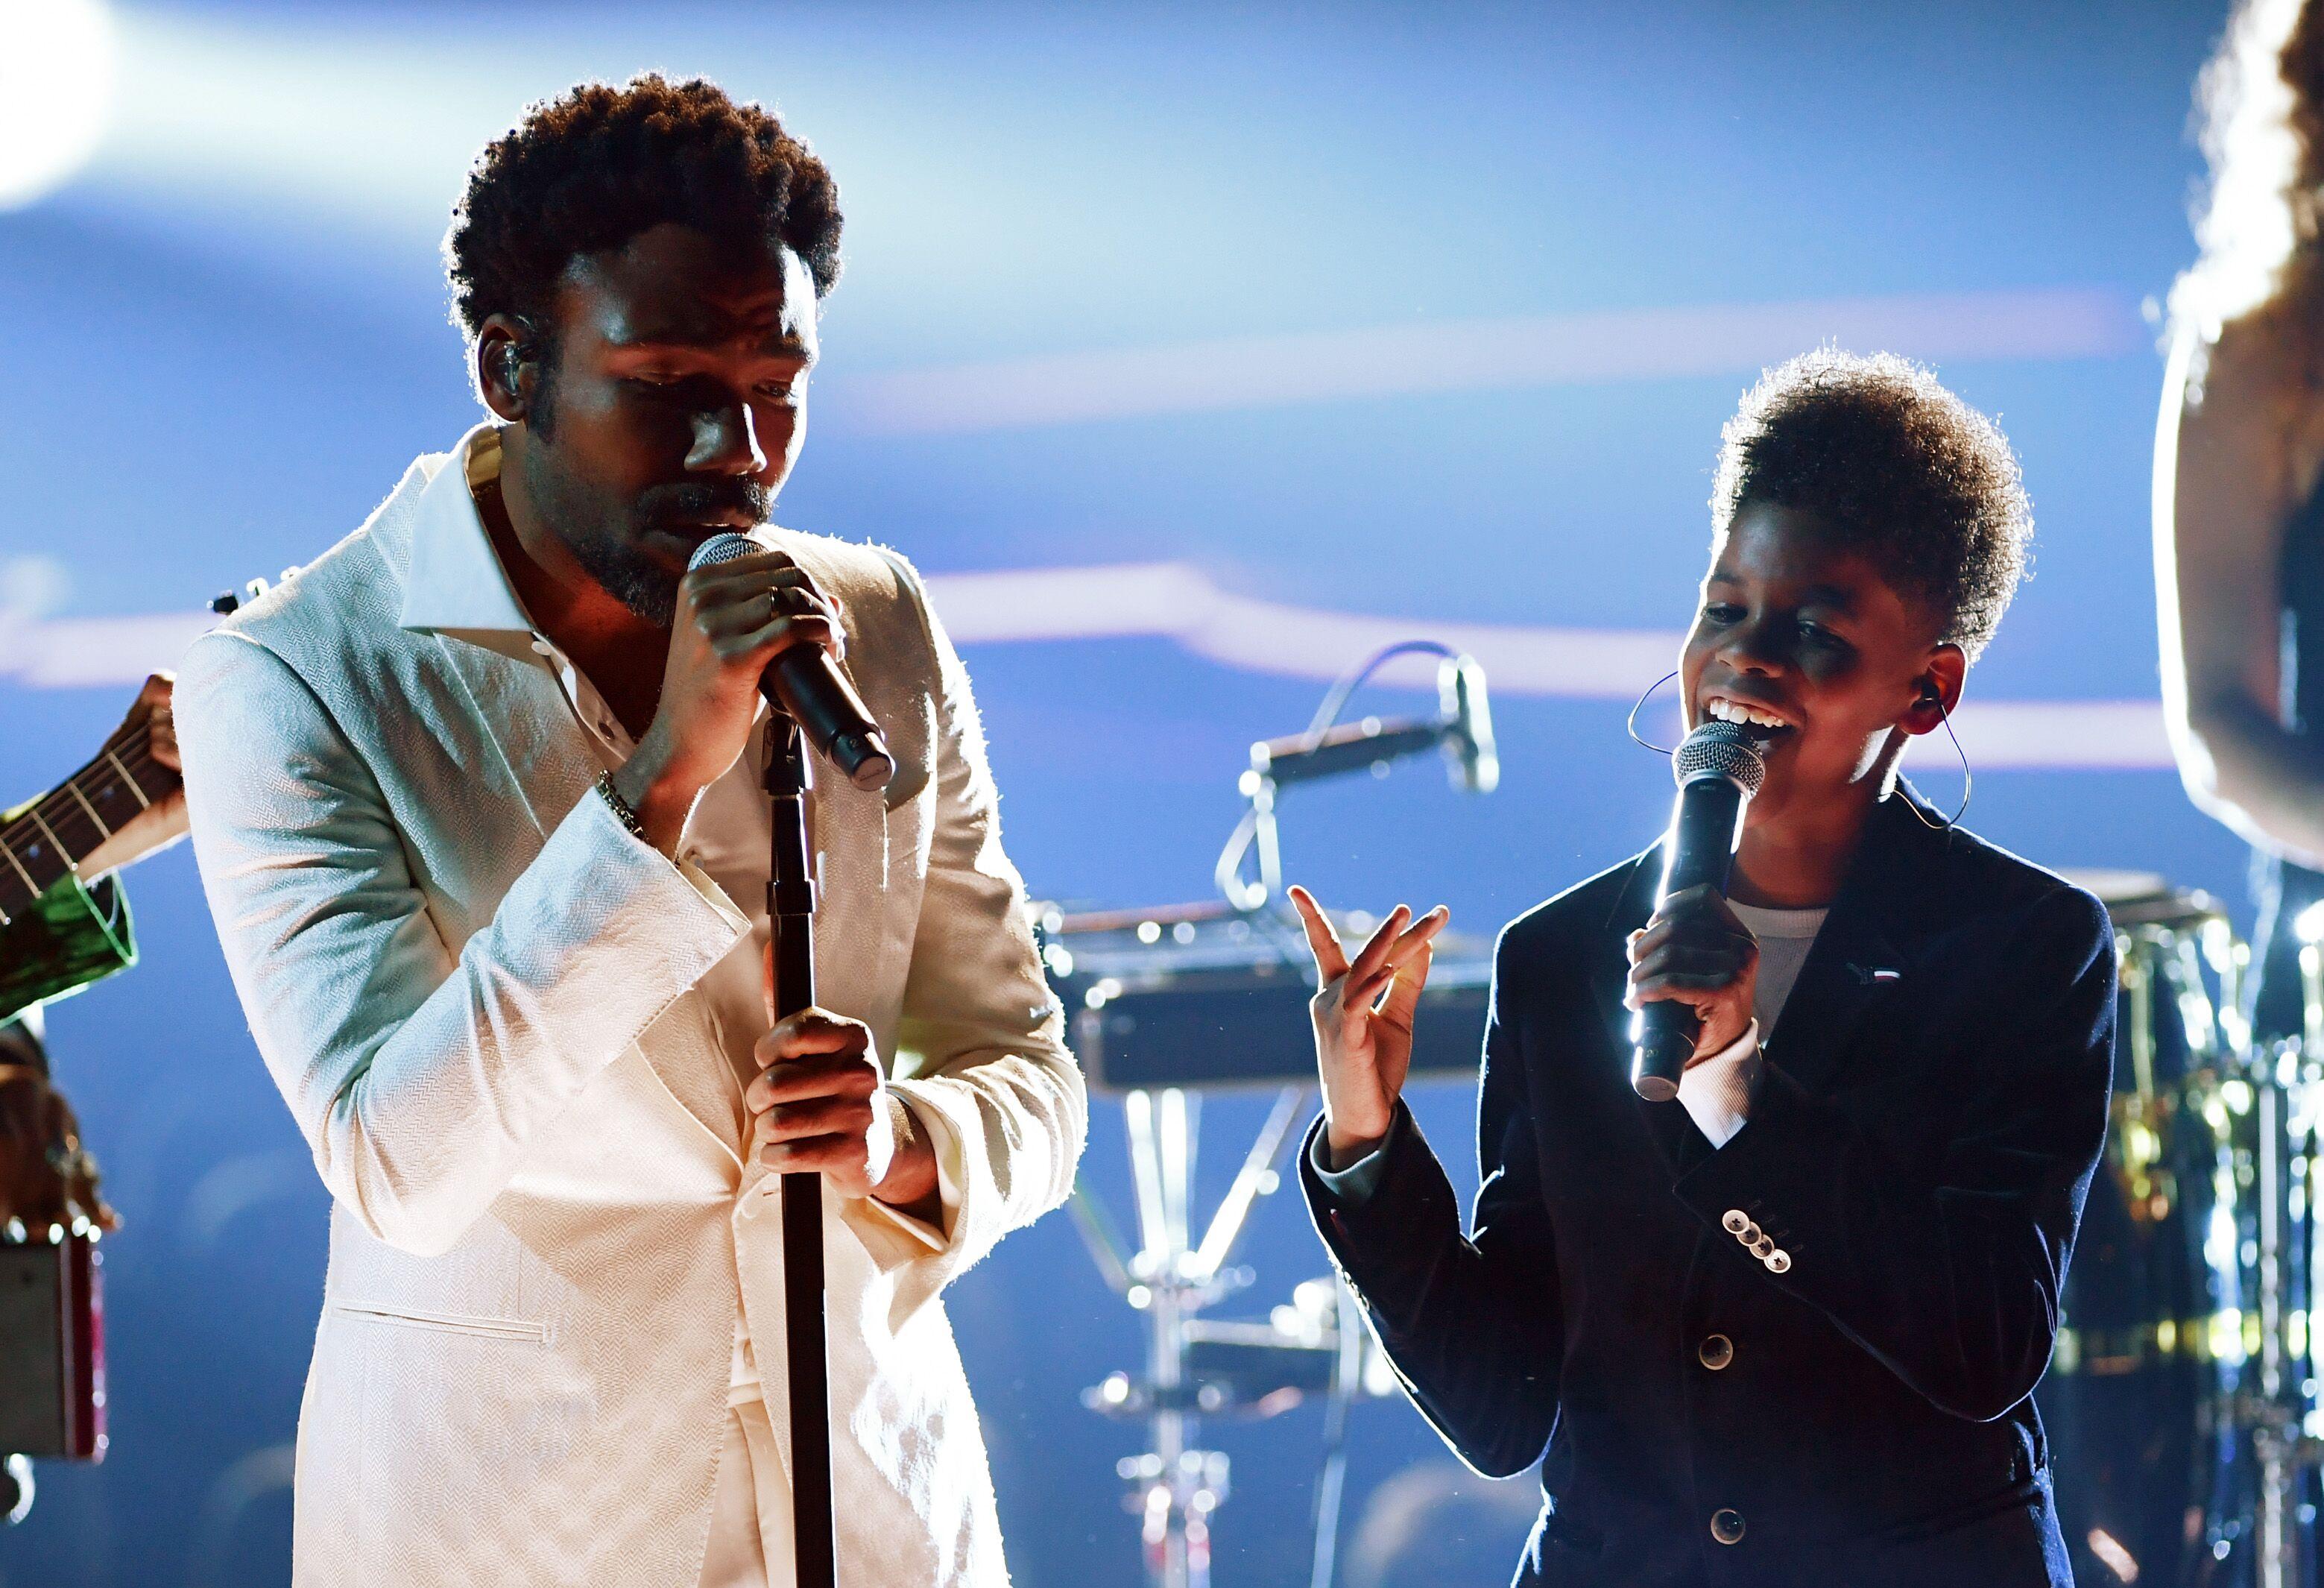 Grammys 2018 Who Was The Kid With Childish Gambino